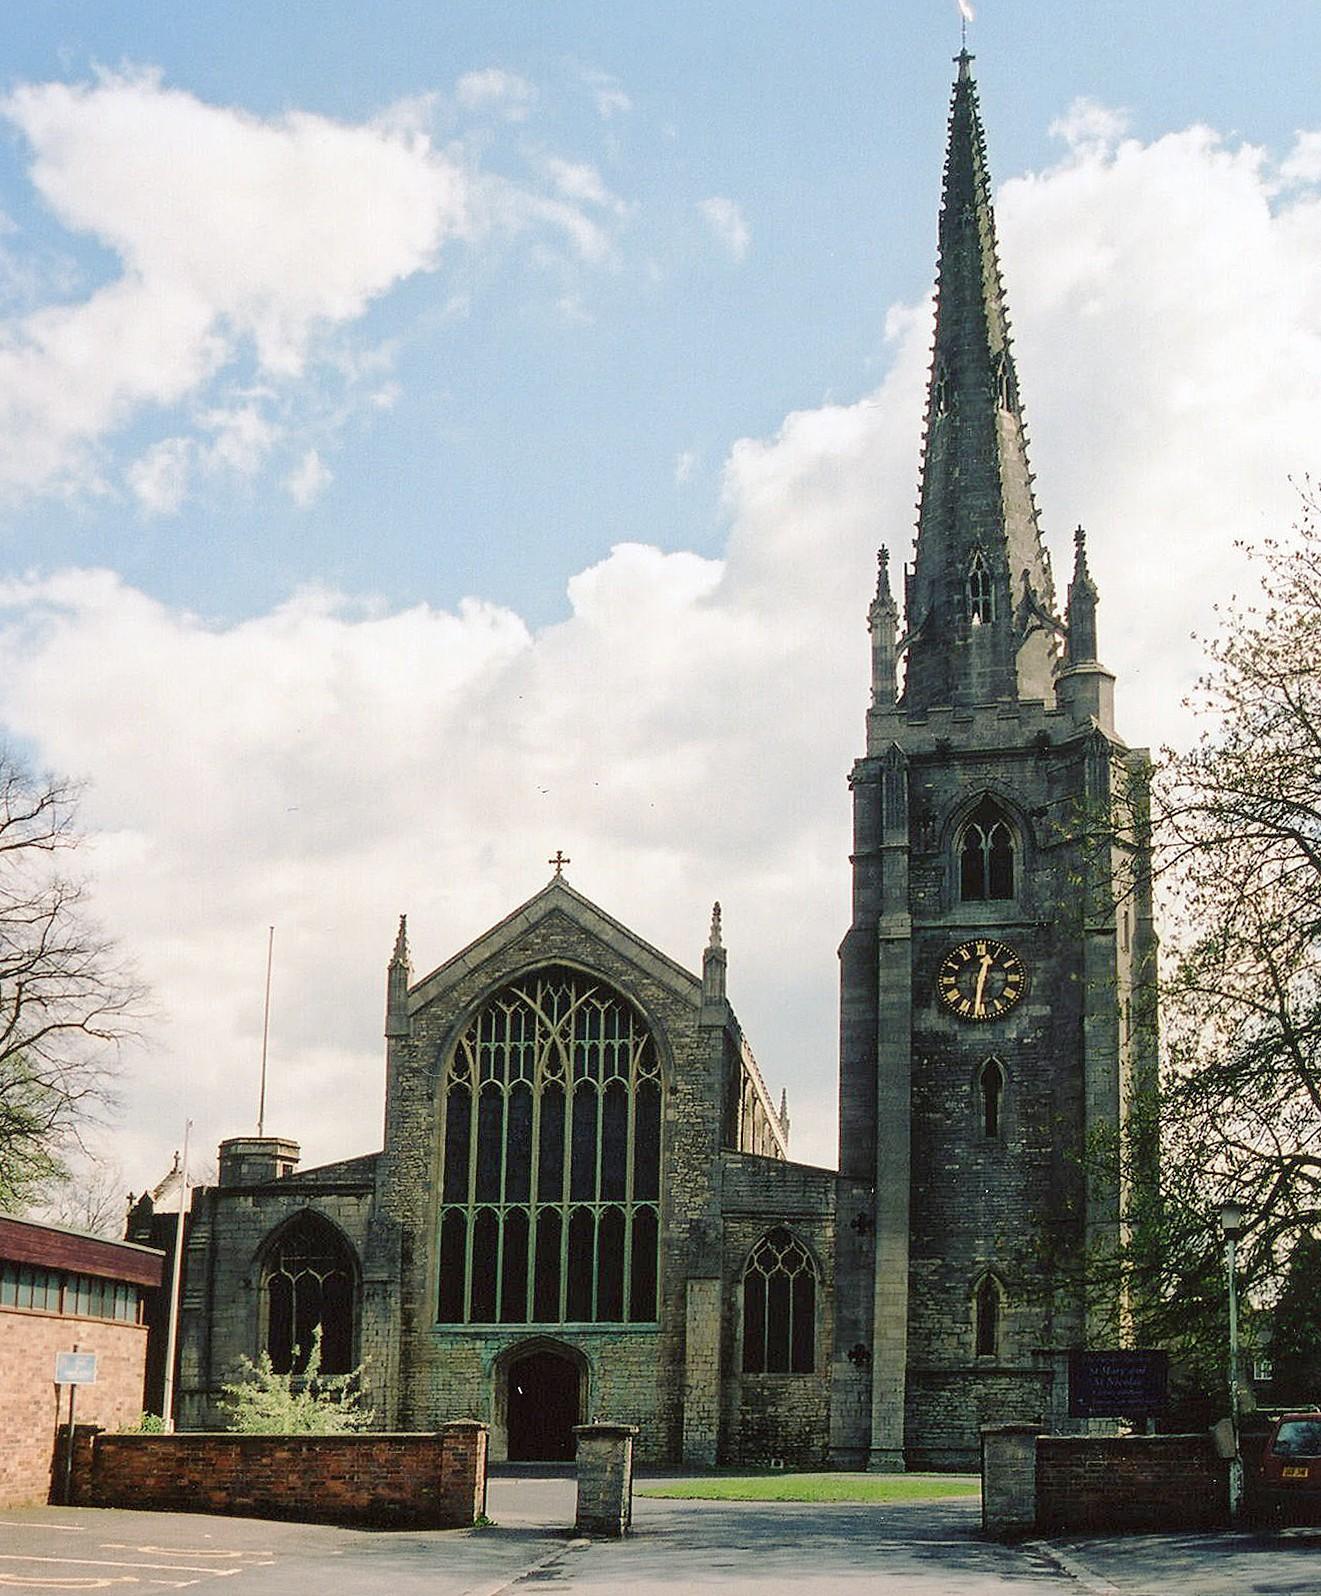 St. Mary and St. Nicholas Church